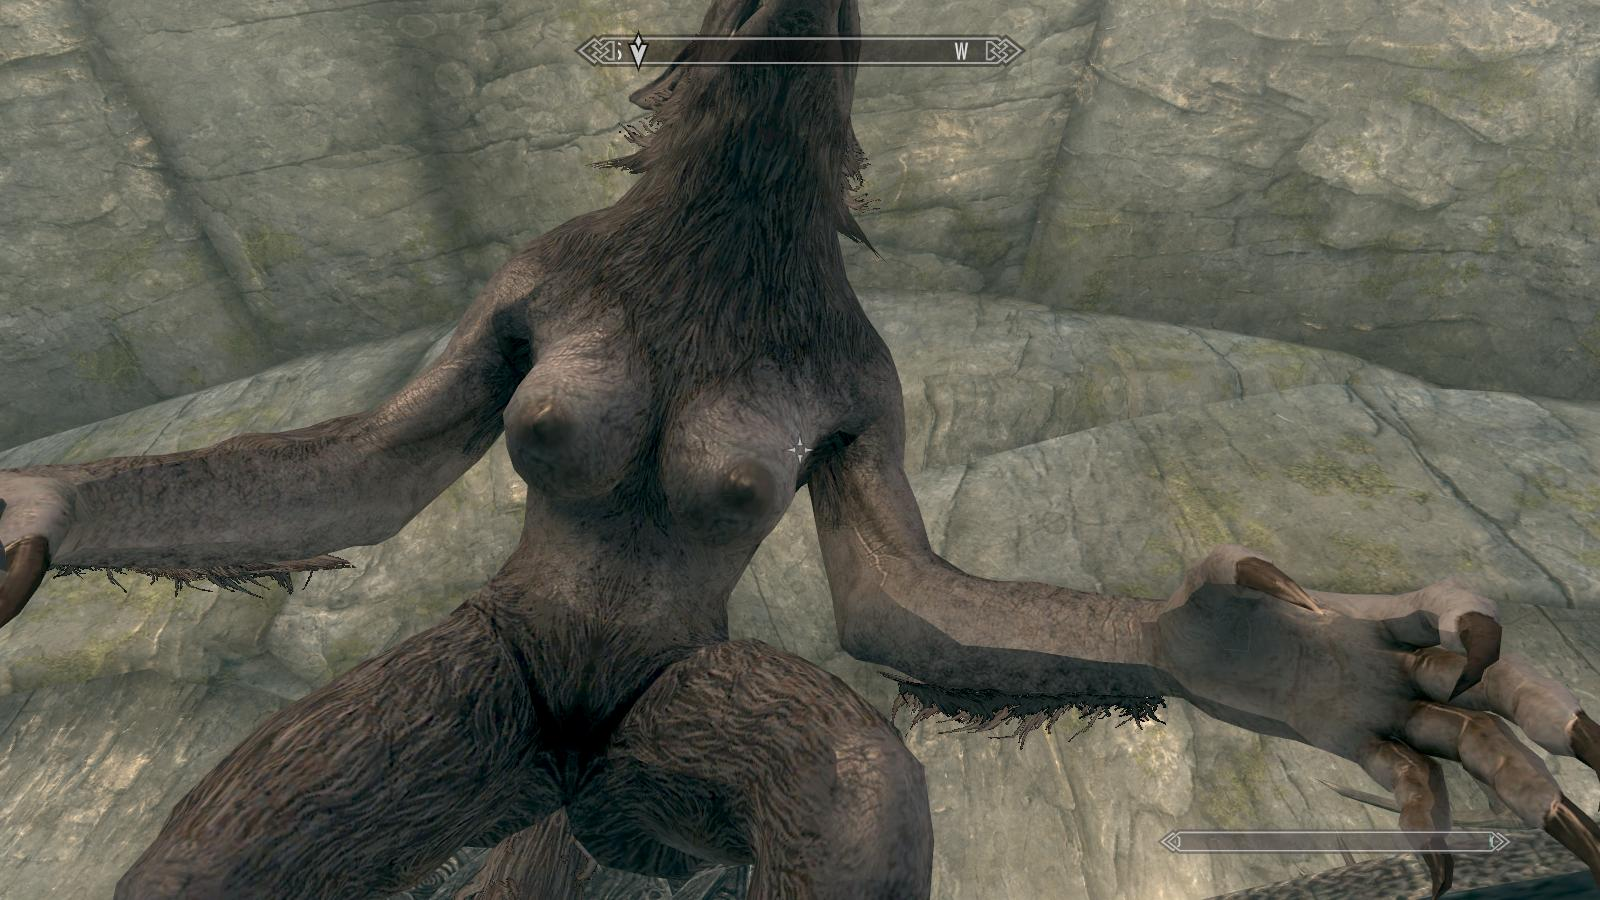 Xxx skyrim images hentay scene